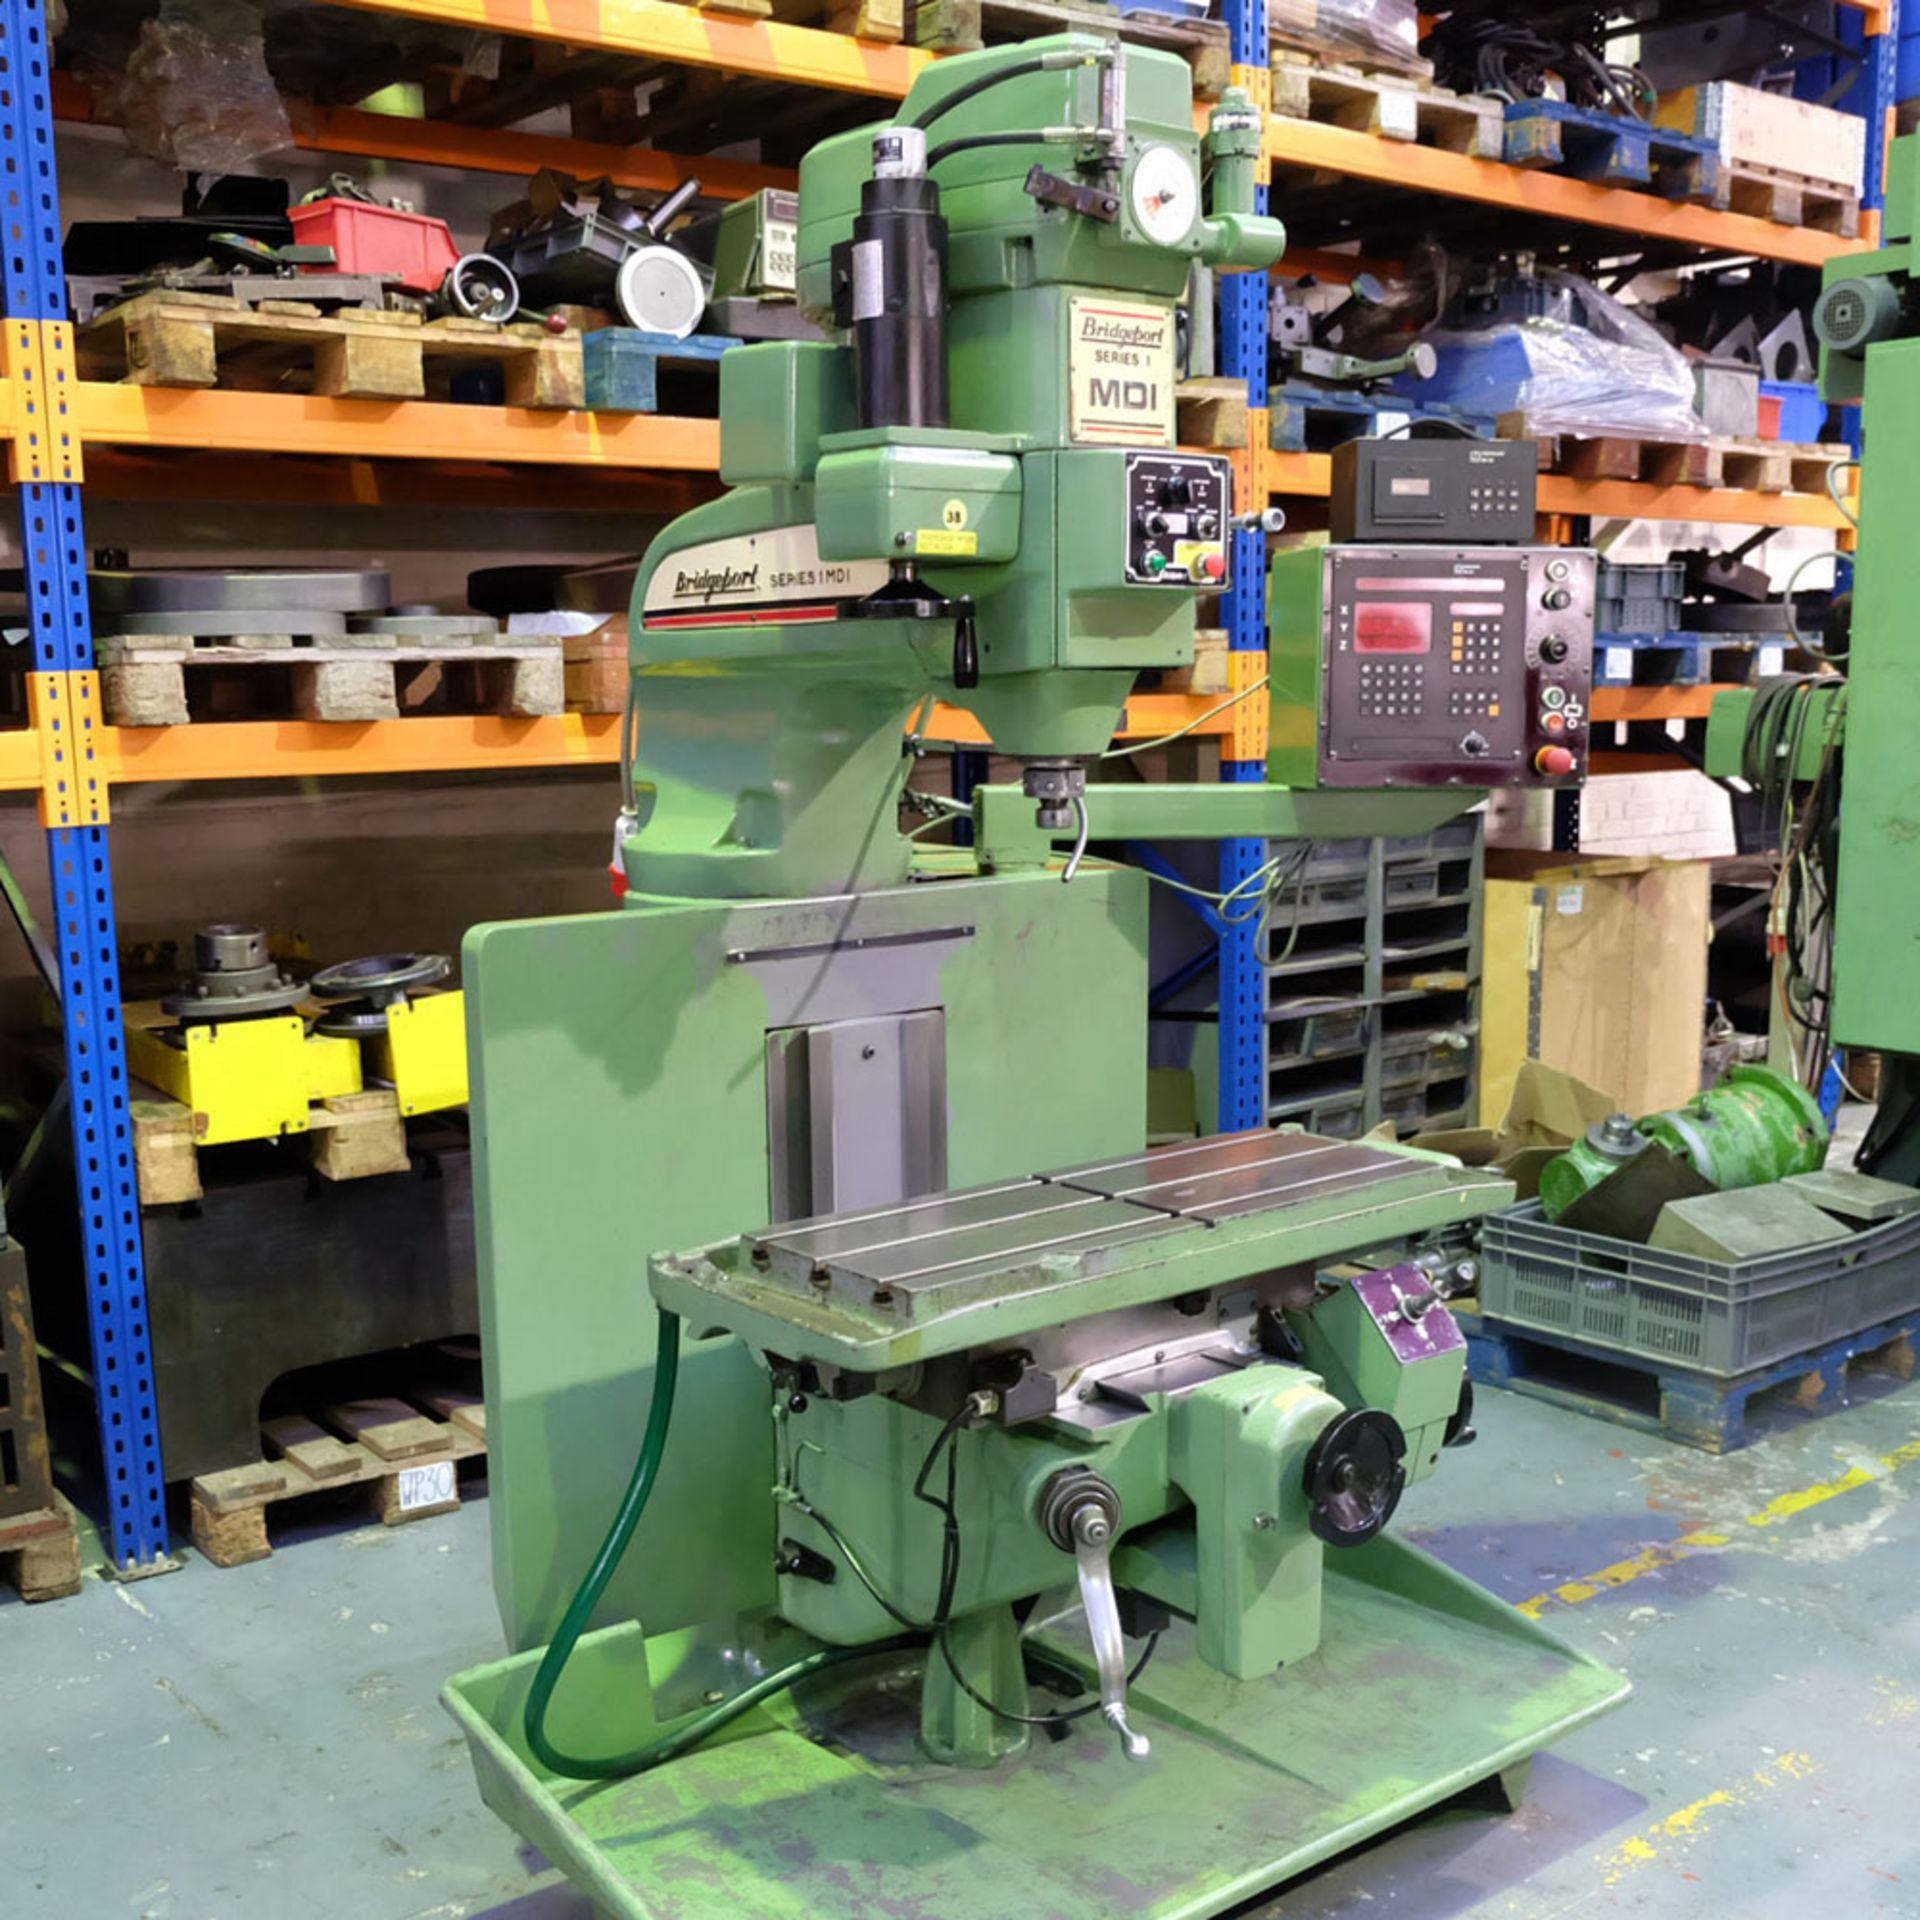 Bridgeport Series 1 MDI. CNC Mill with Heidenhain TNC131 3 Axis Control. - Image 2 of 14